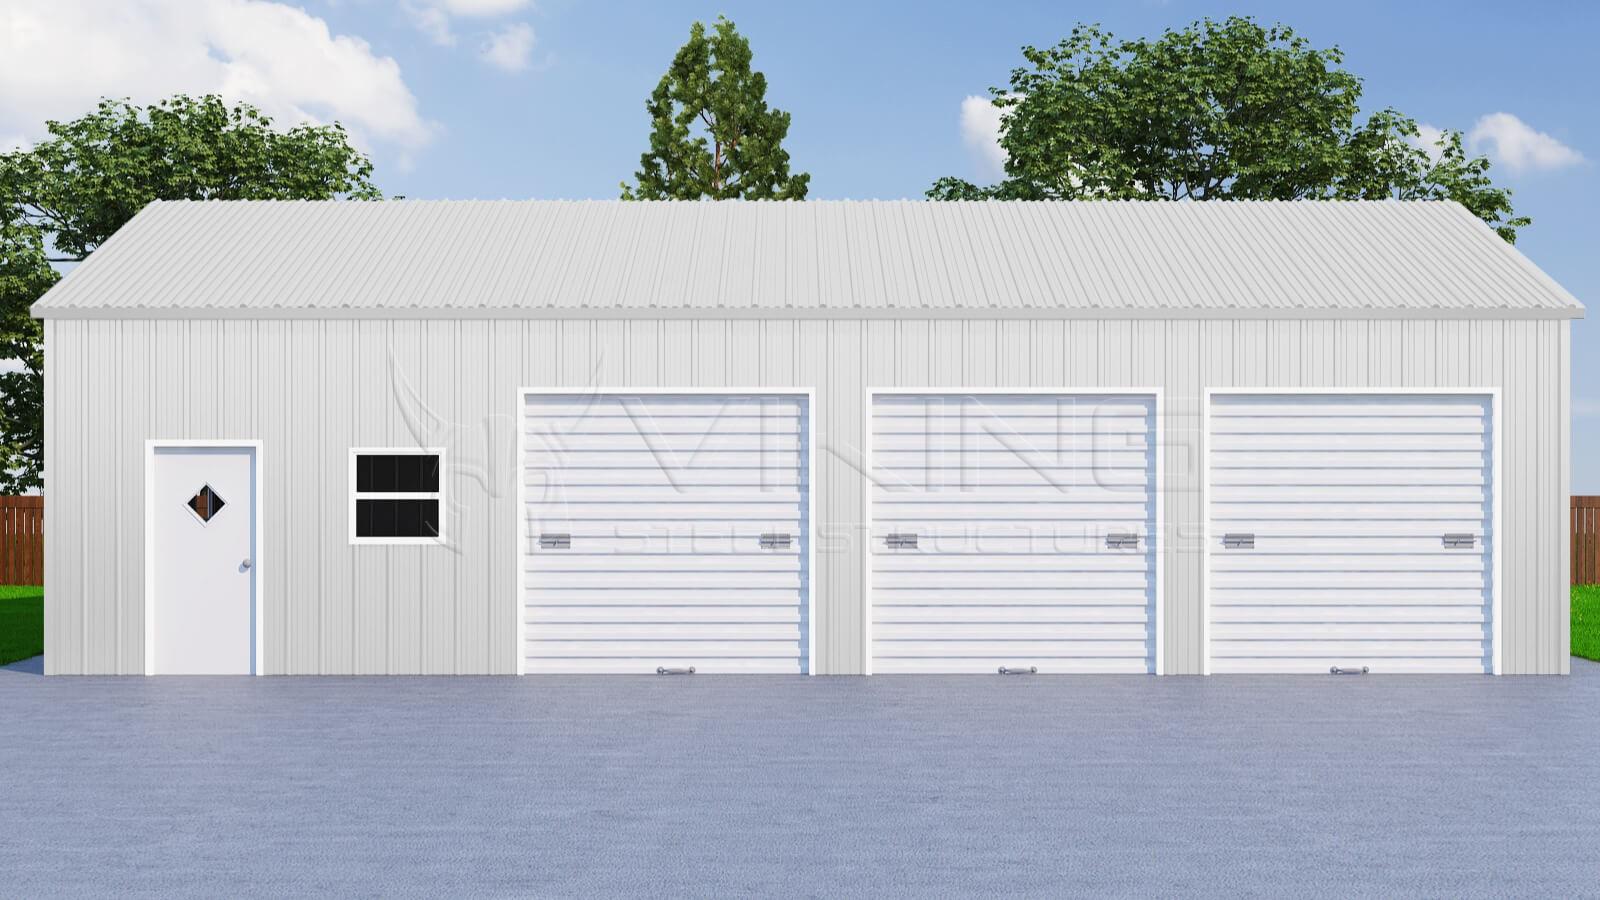 26x41 three car metal garage rubansaba